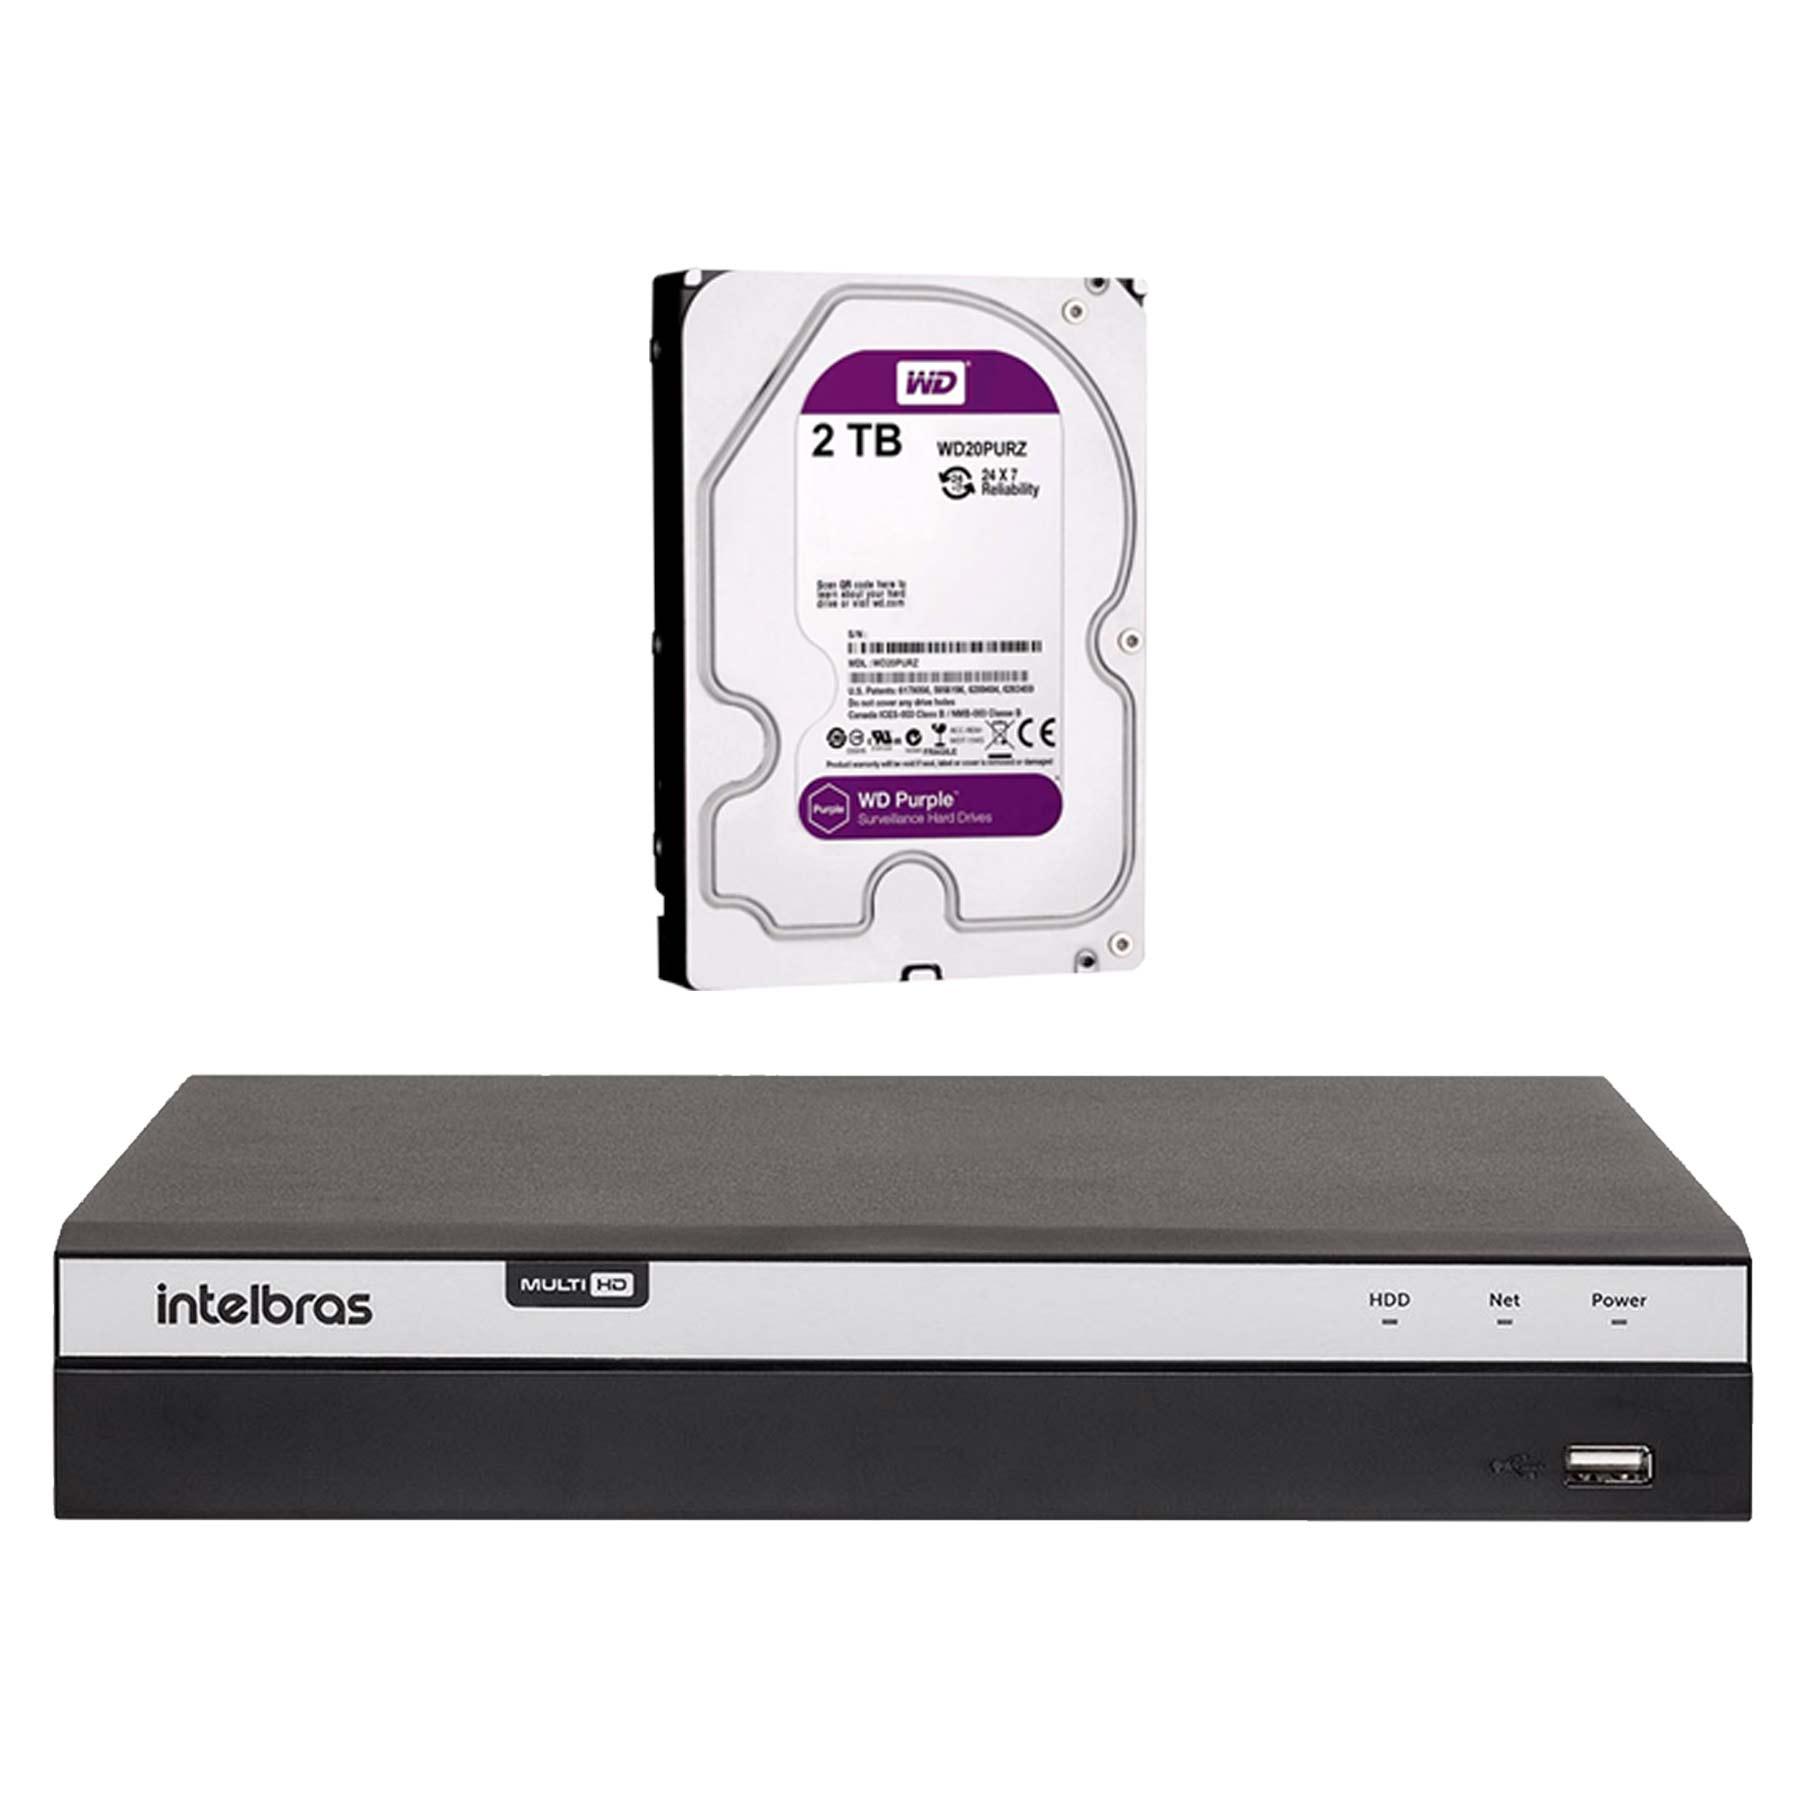 kit-8-cameras-de-seguranca-vhd-1220-b-full-color-de-alta-definicao-full-hd-1080p-dvr-intelbras-full-hd-mhdx-3108-de-08-canais-acessorios-04